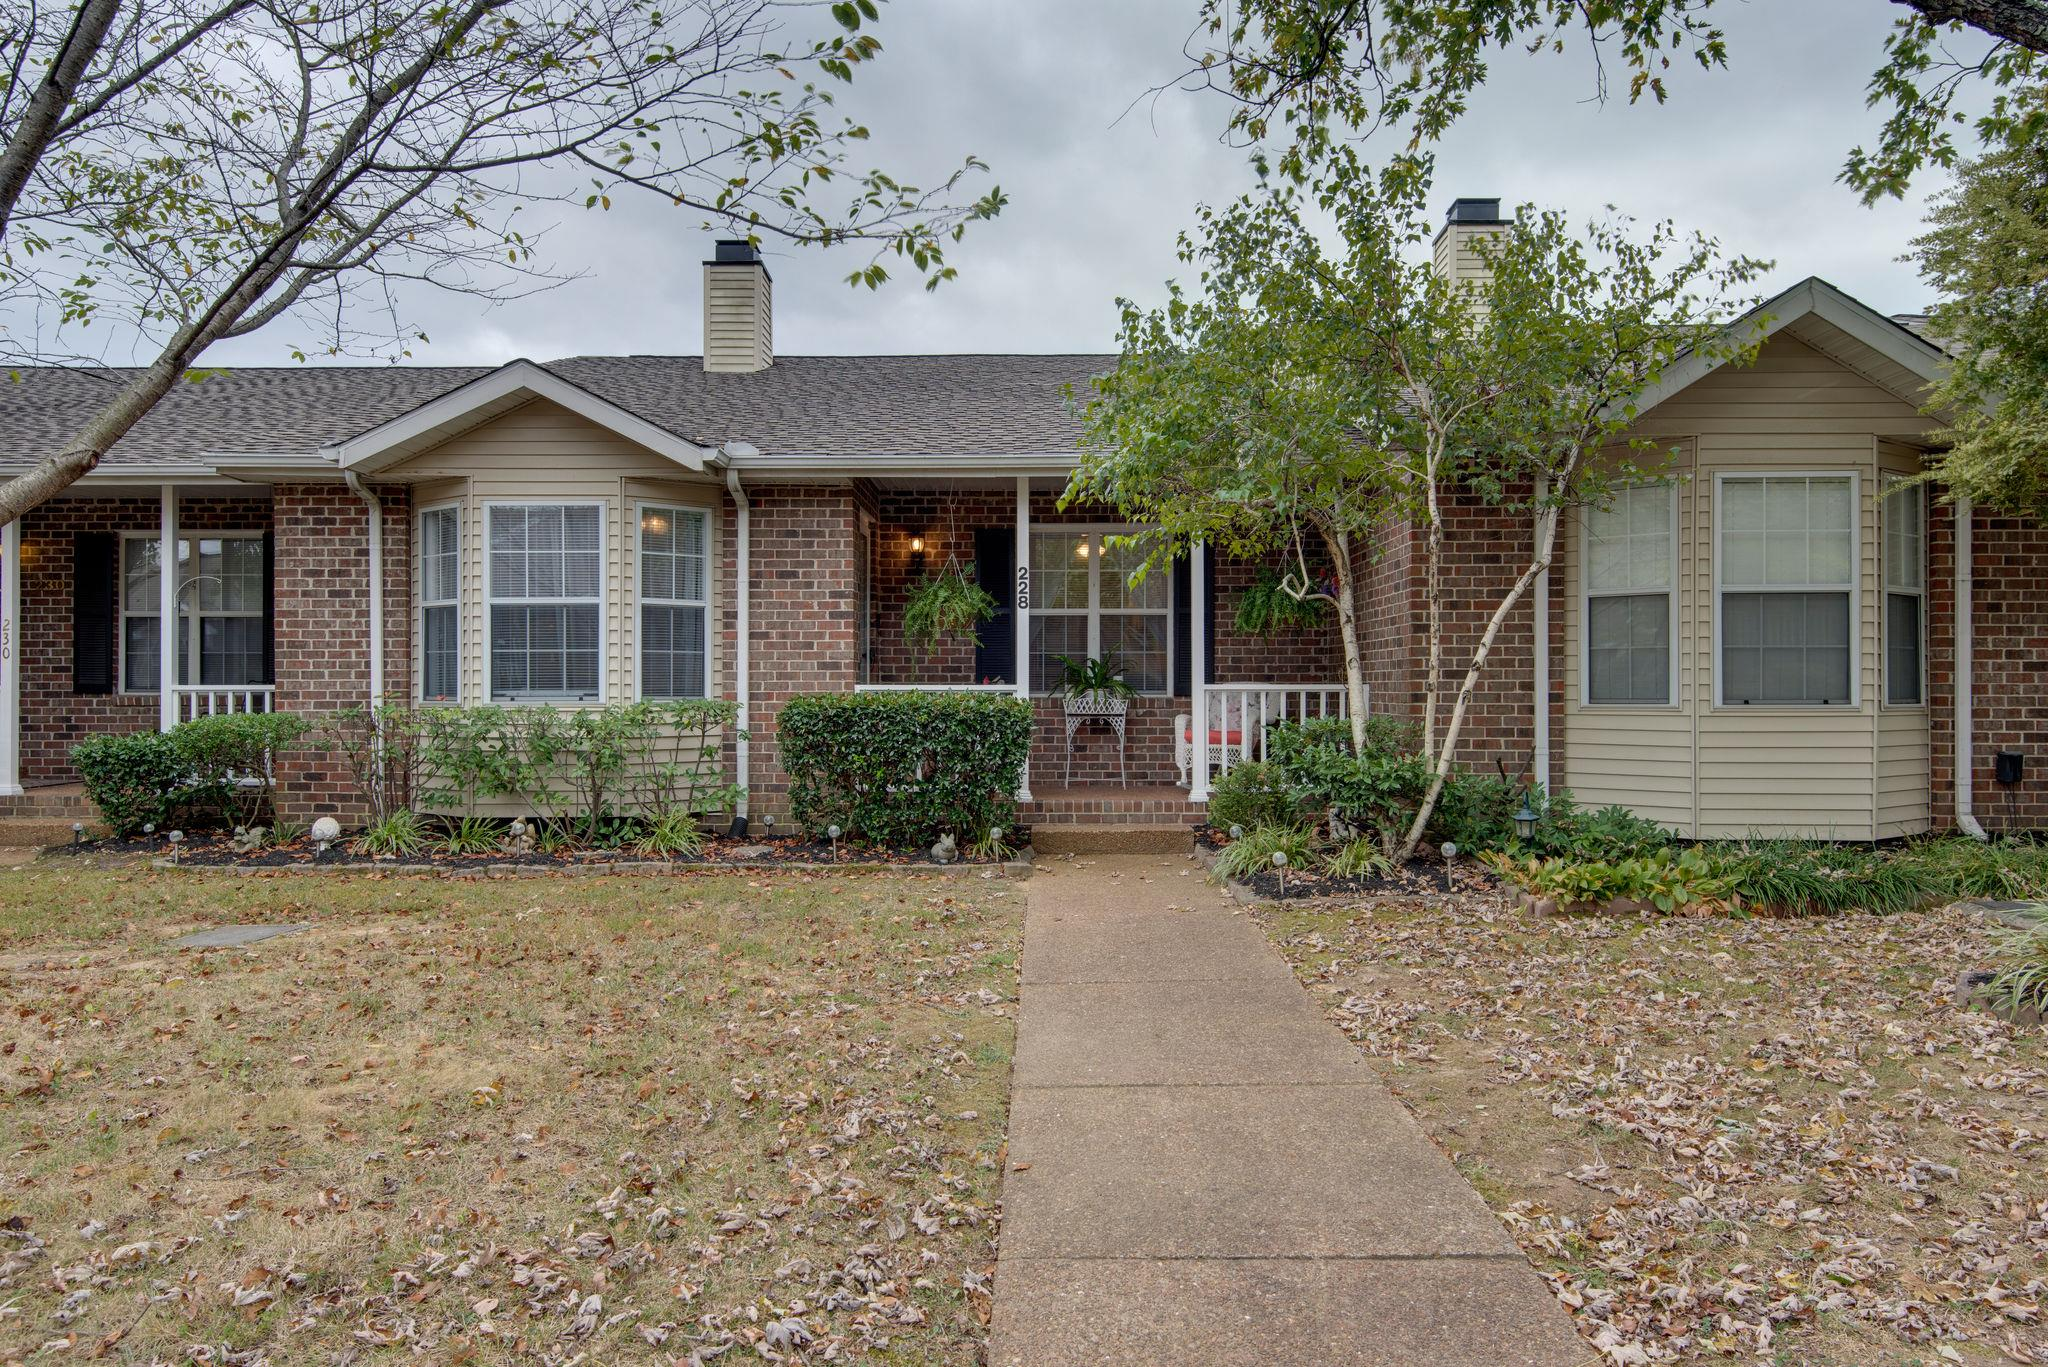 228 Pepper Ridge Cir, Antioch, TN 37013 - Antioch, TN real estate listing